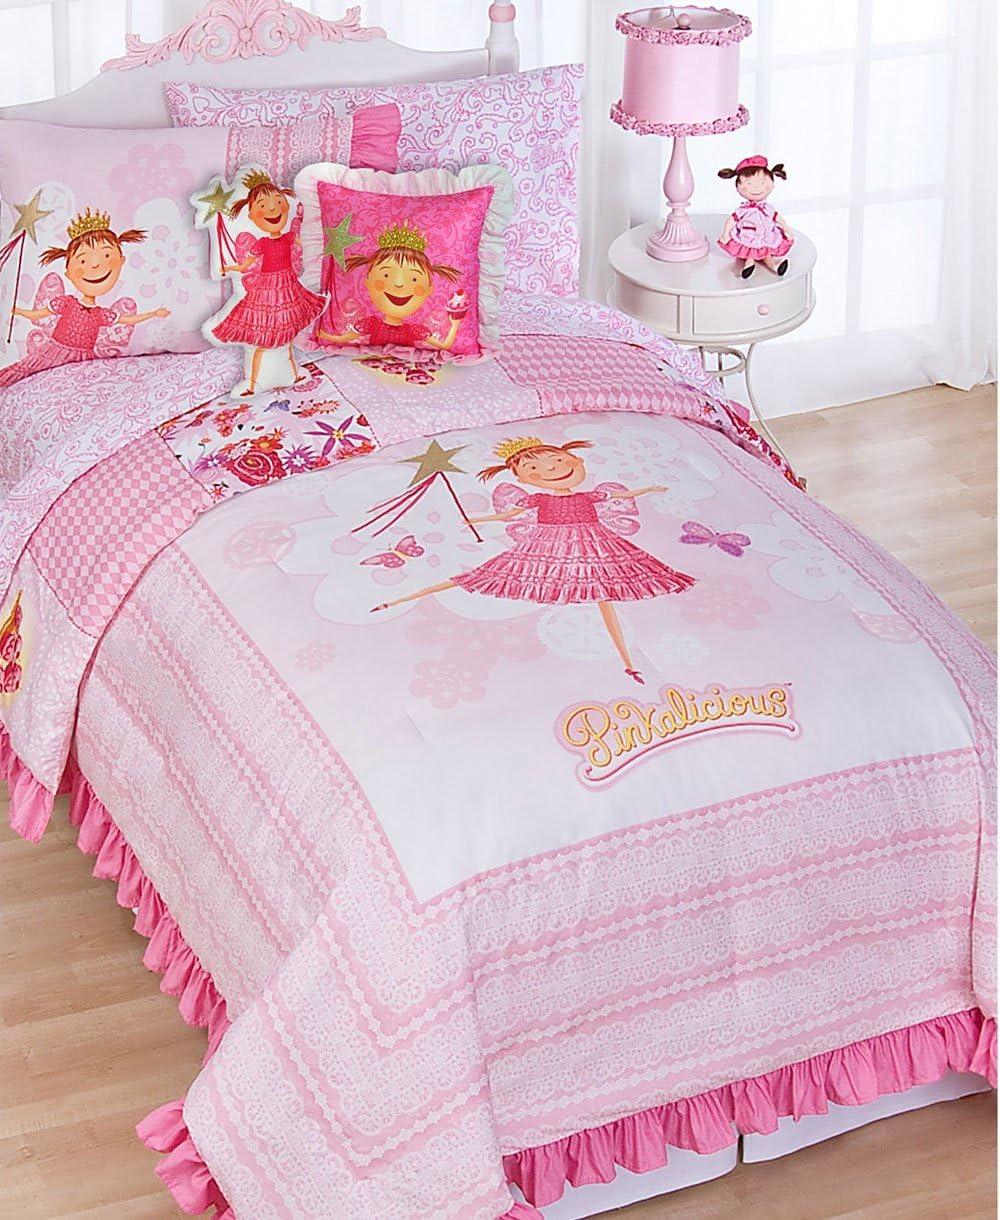 Decroom Eyelash Serum, Full, Pink